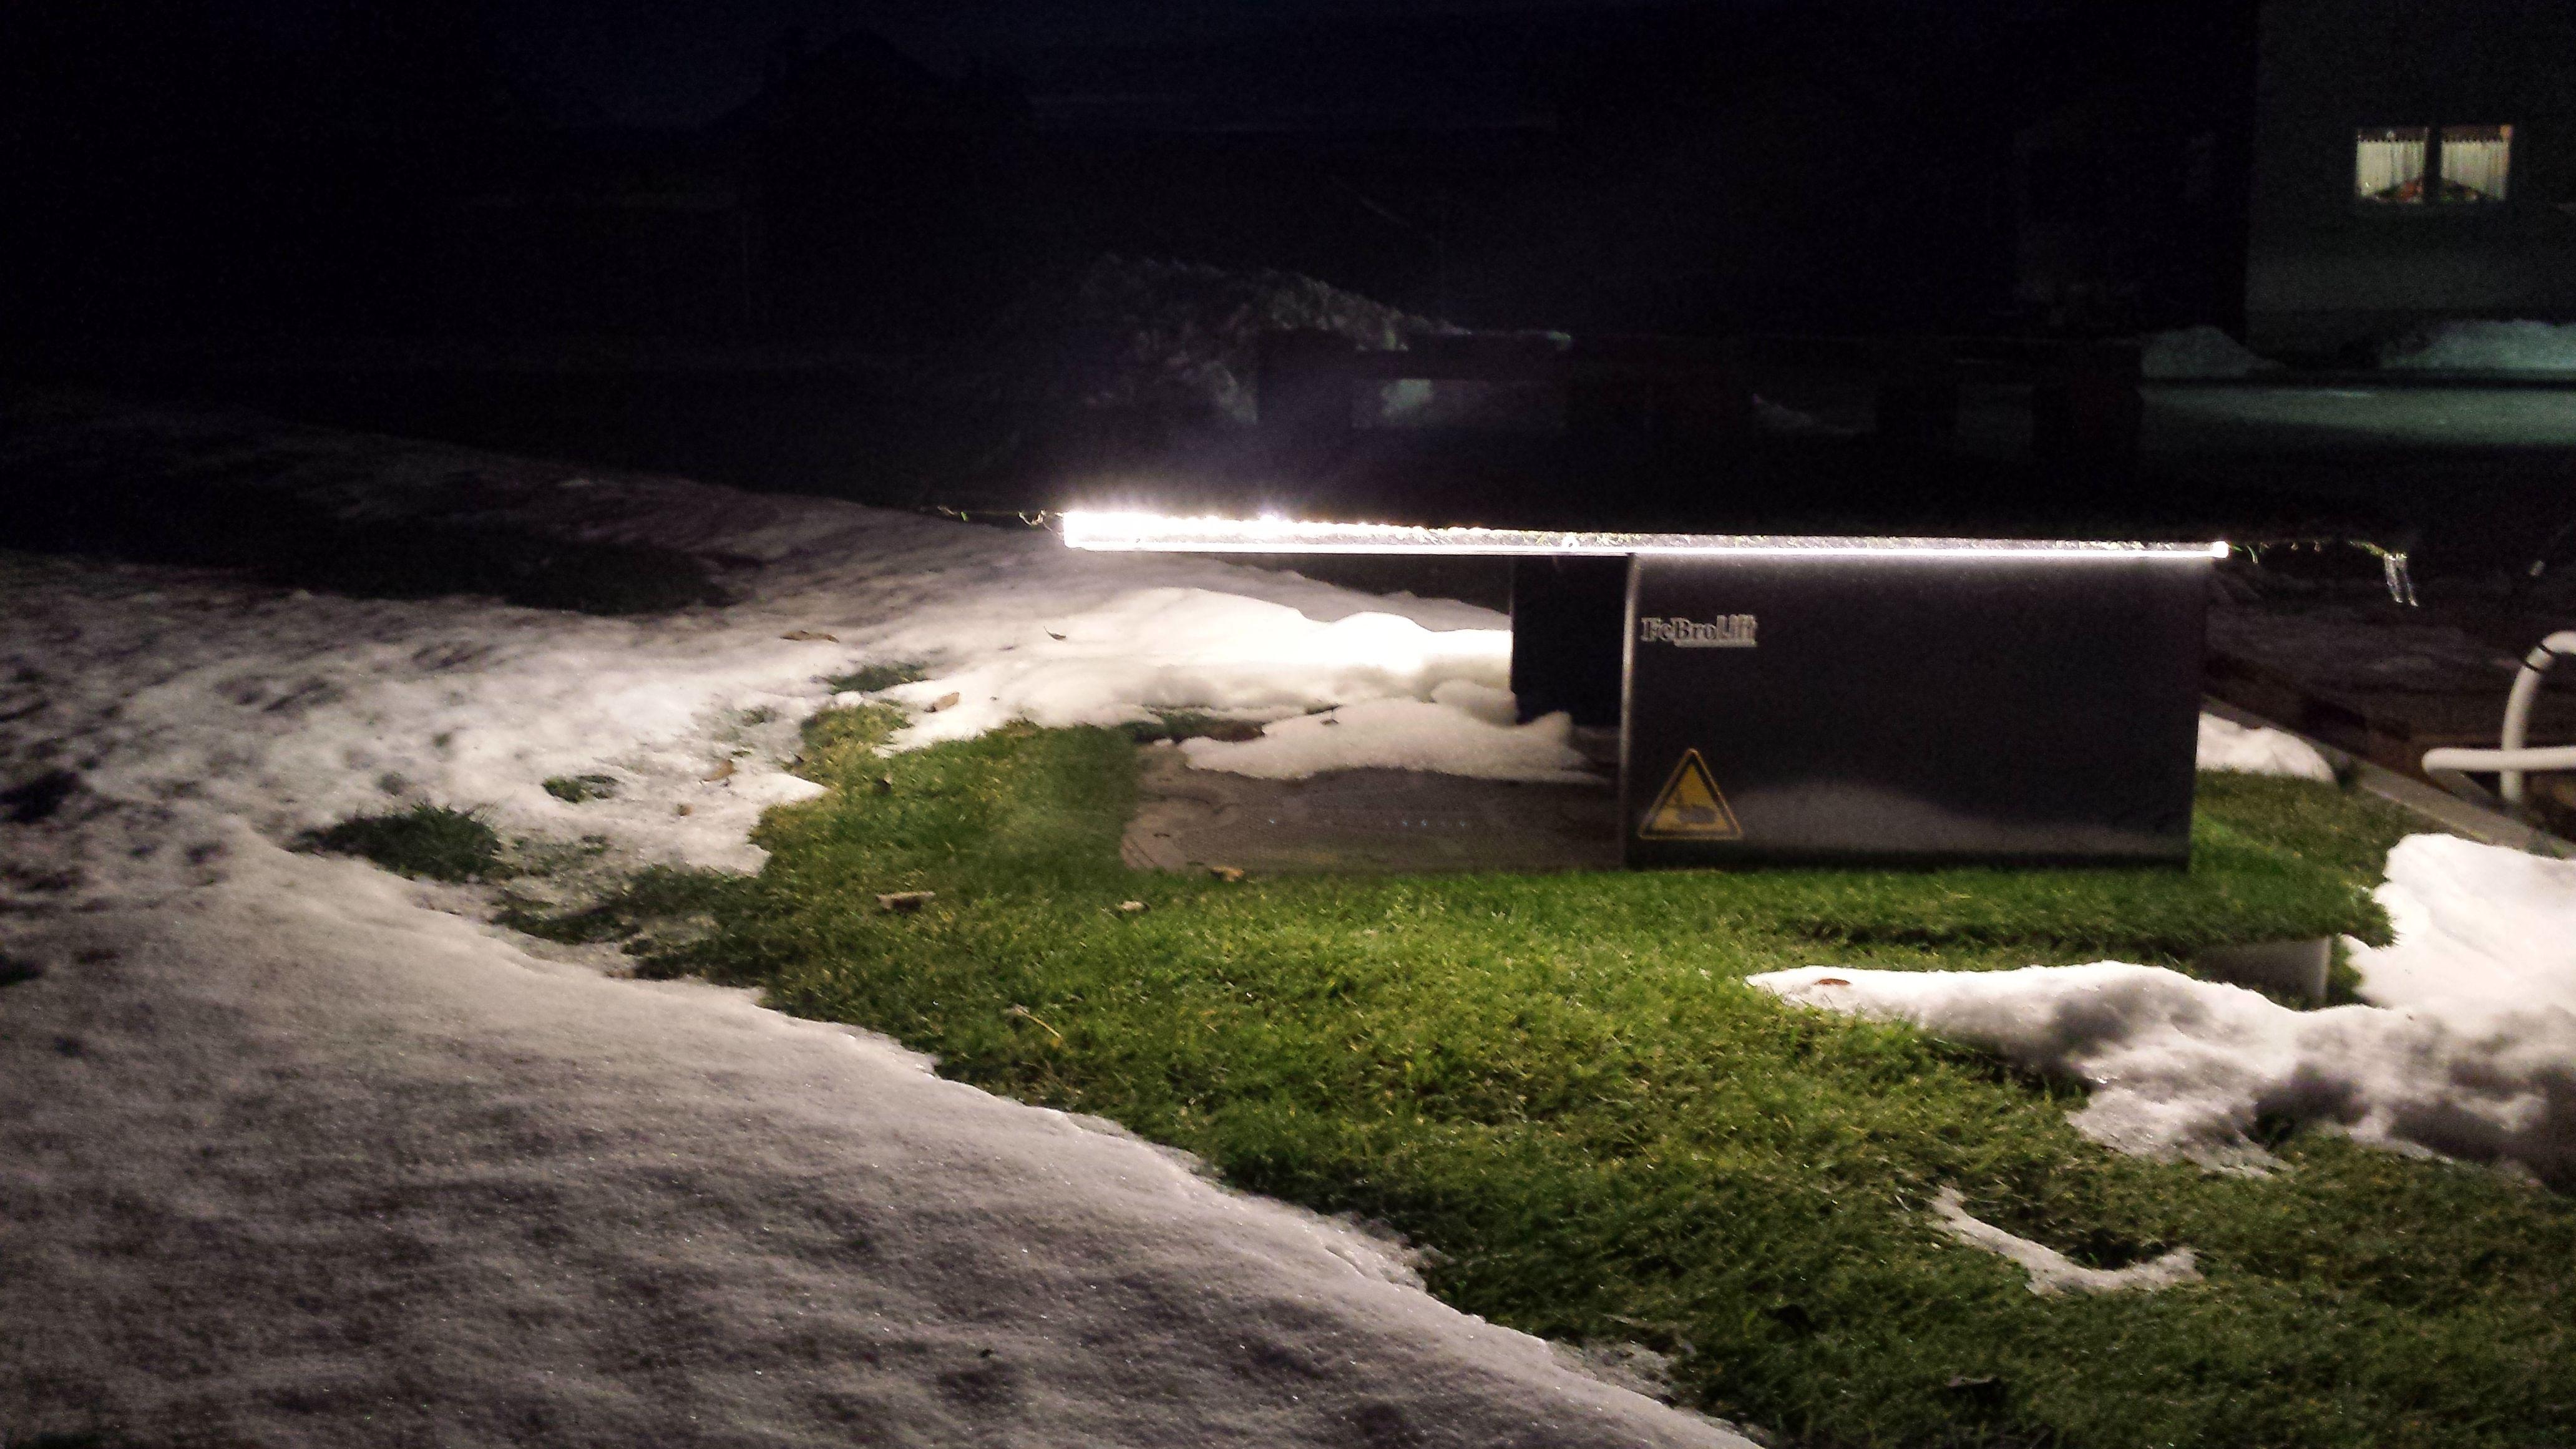 Mahroboter Tiefgarage Im Winter Automower